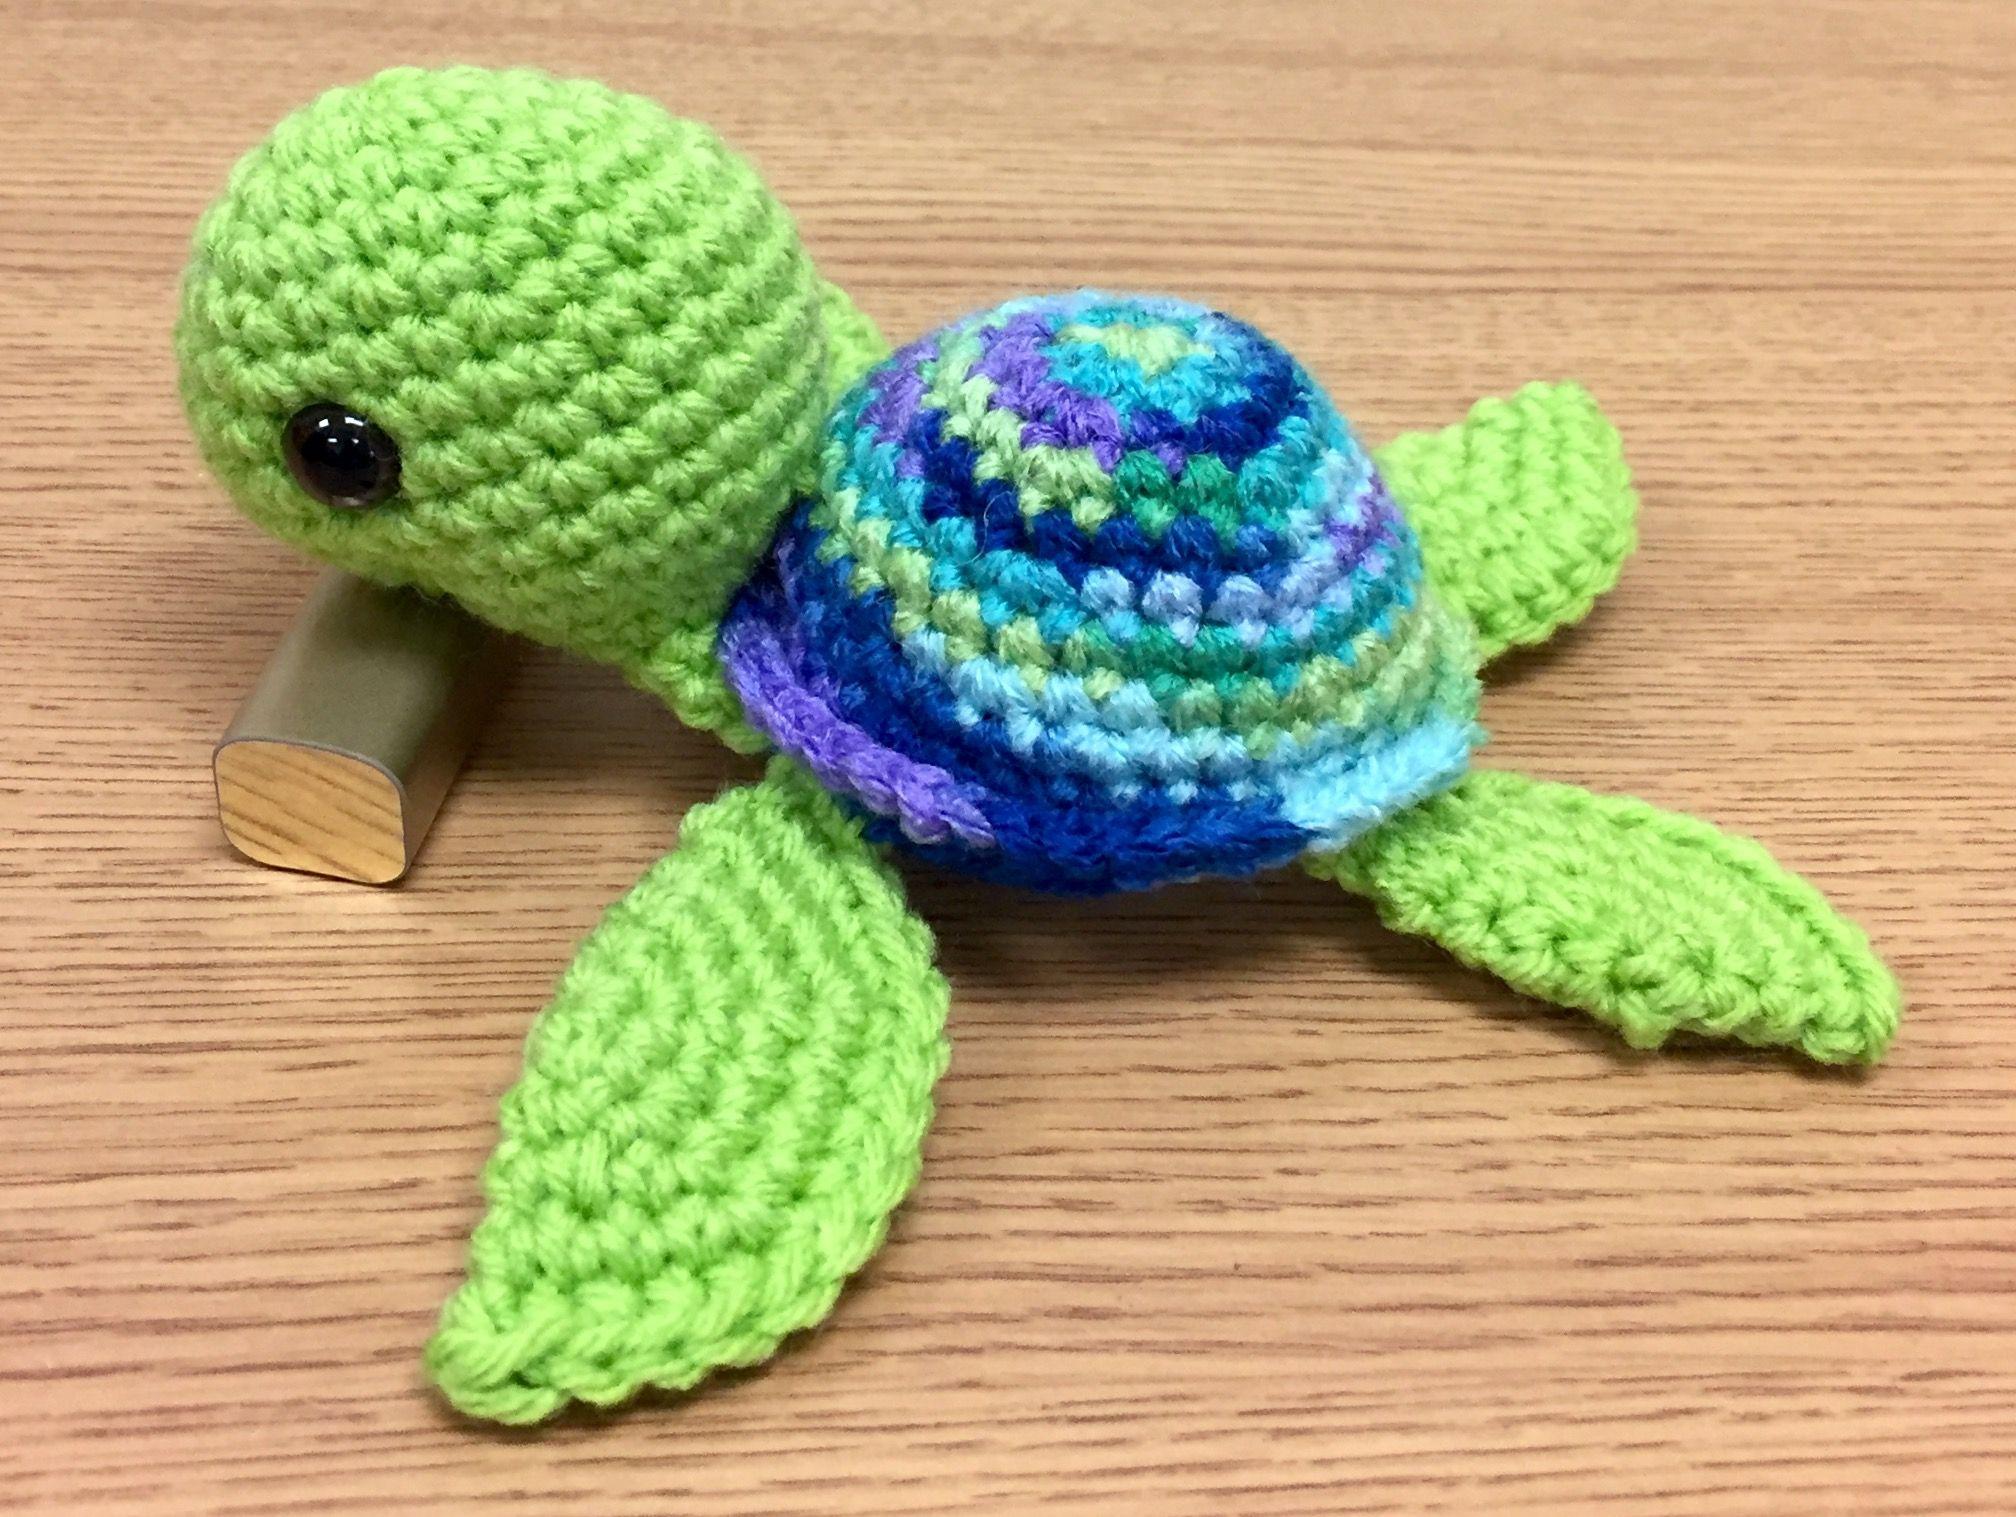 14+ Baby safe stuffed animals ideas